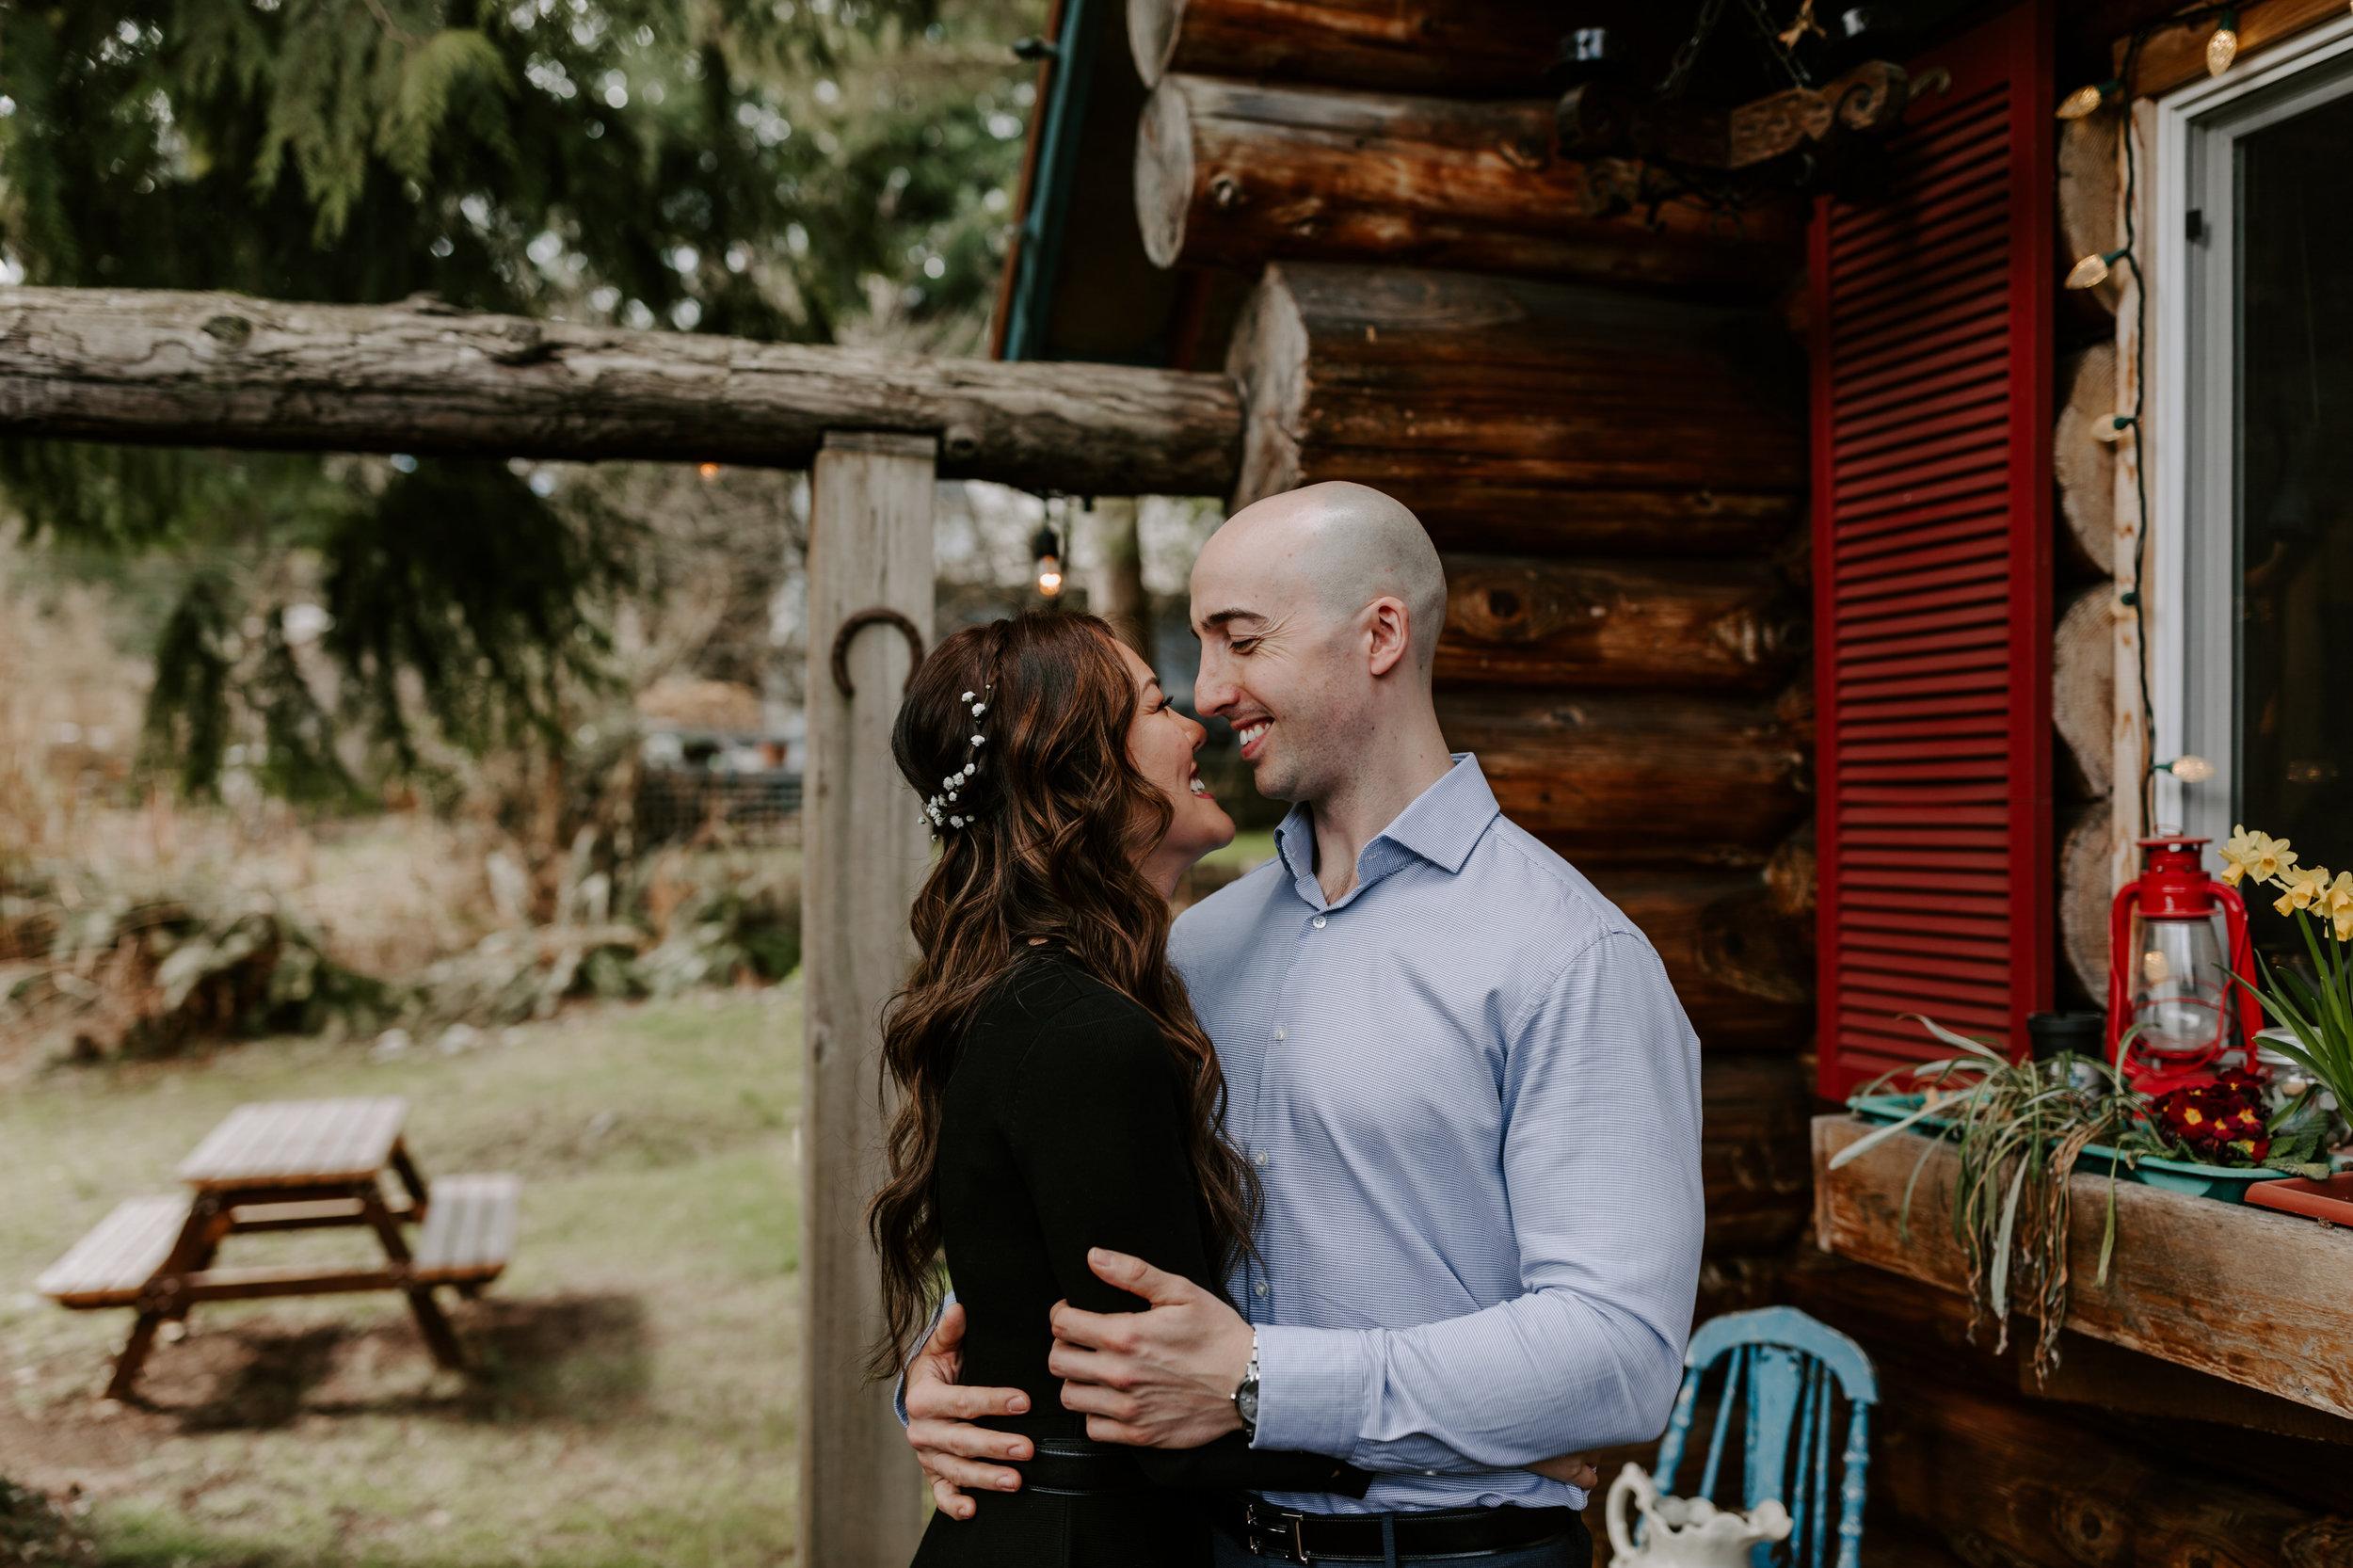 Sunshine Coast Elopement Photos - Forest Wedding - Beach Wedding - Sunshine Coast Wedding Photographer - Vancouver Wedding Photographer - Vancouver Wedding Videographer - 989.JPG